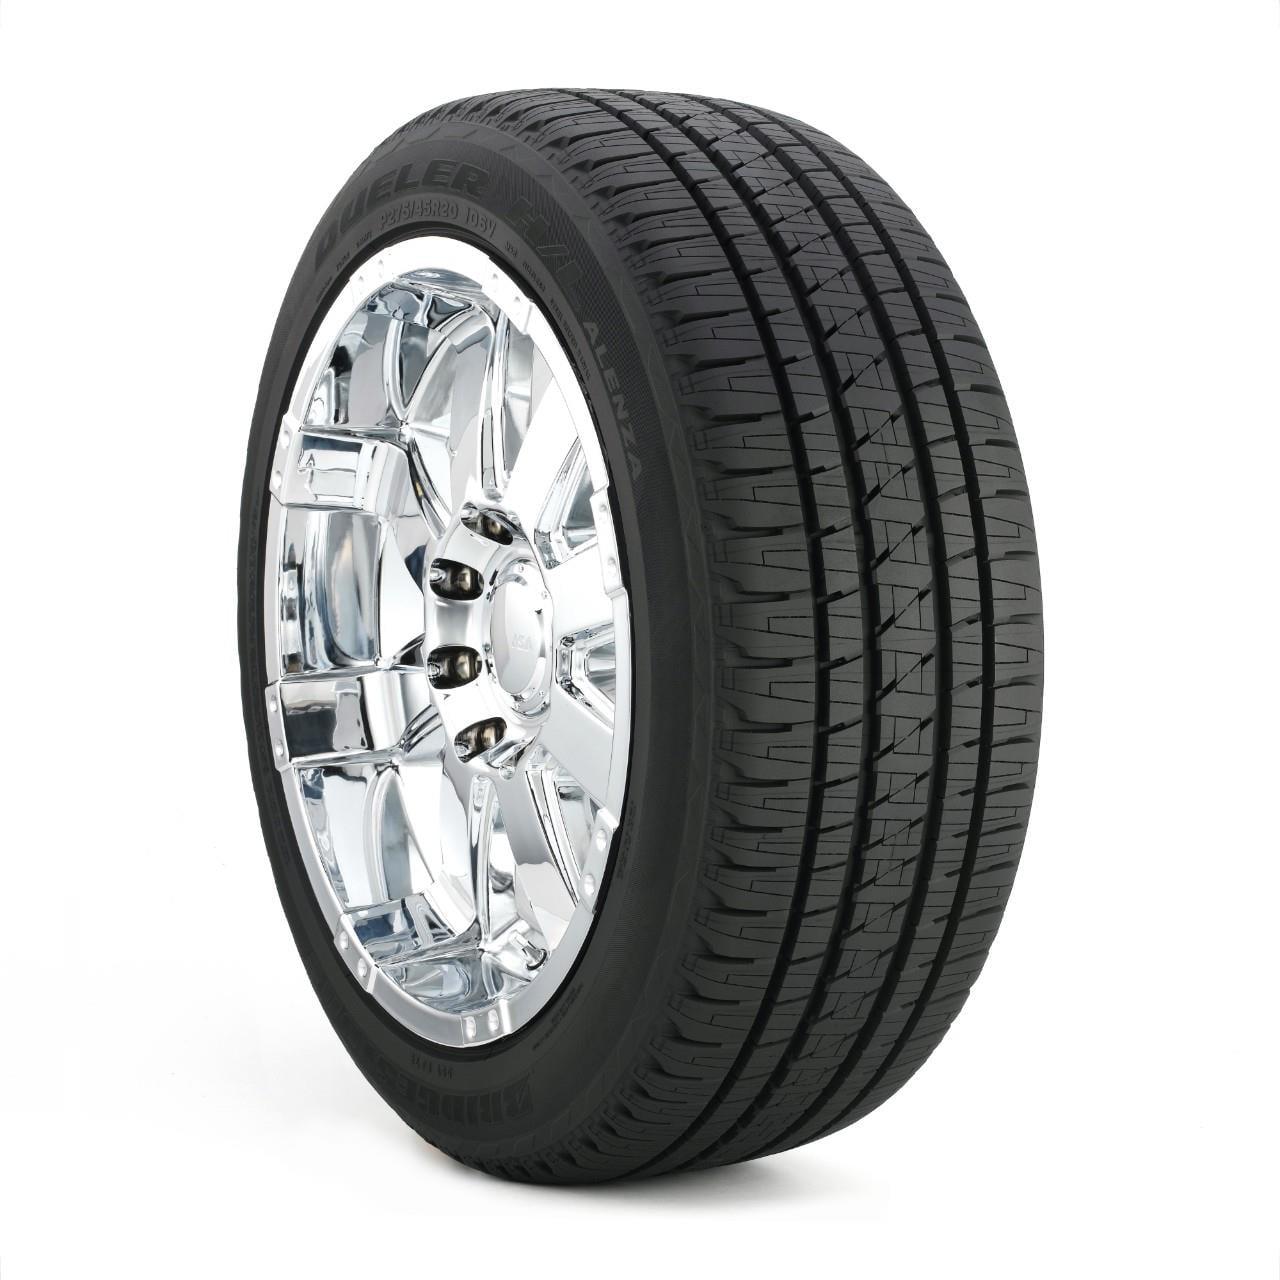 Bridgestone Dueler H/L Alenza Plus Highway Terrain SUV Tire - P265/50R20 106 V